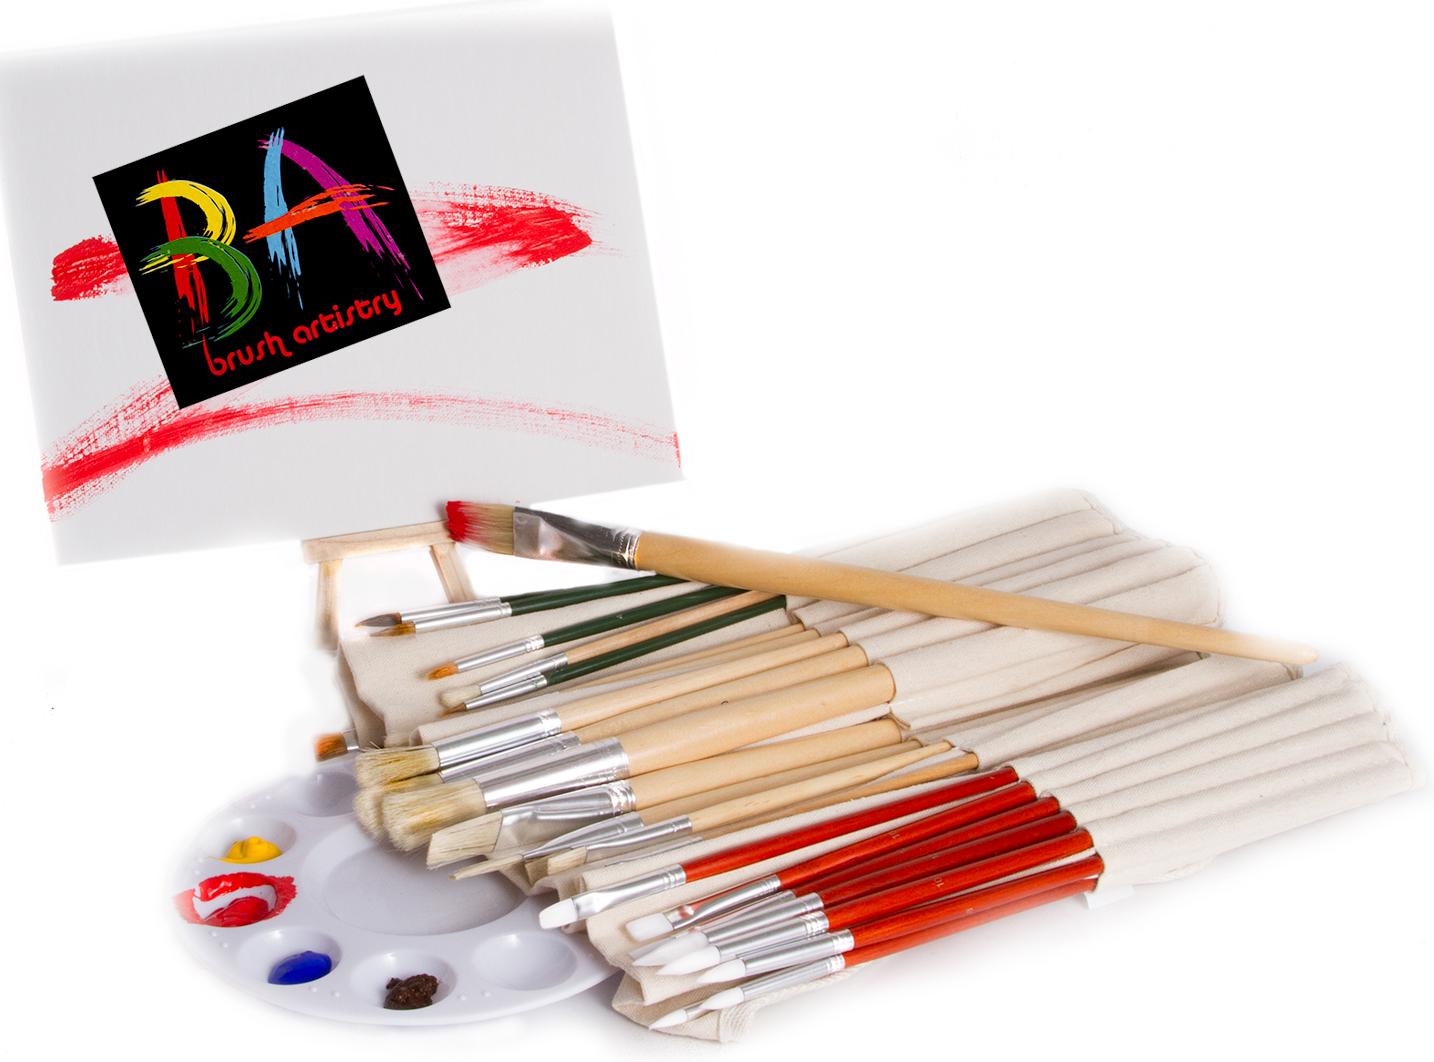 1.0artist-oil-bristle-paint-brushes-1